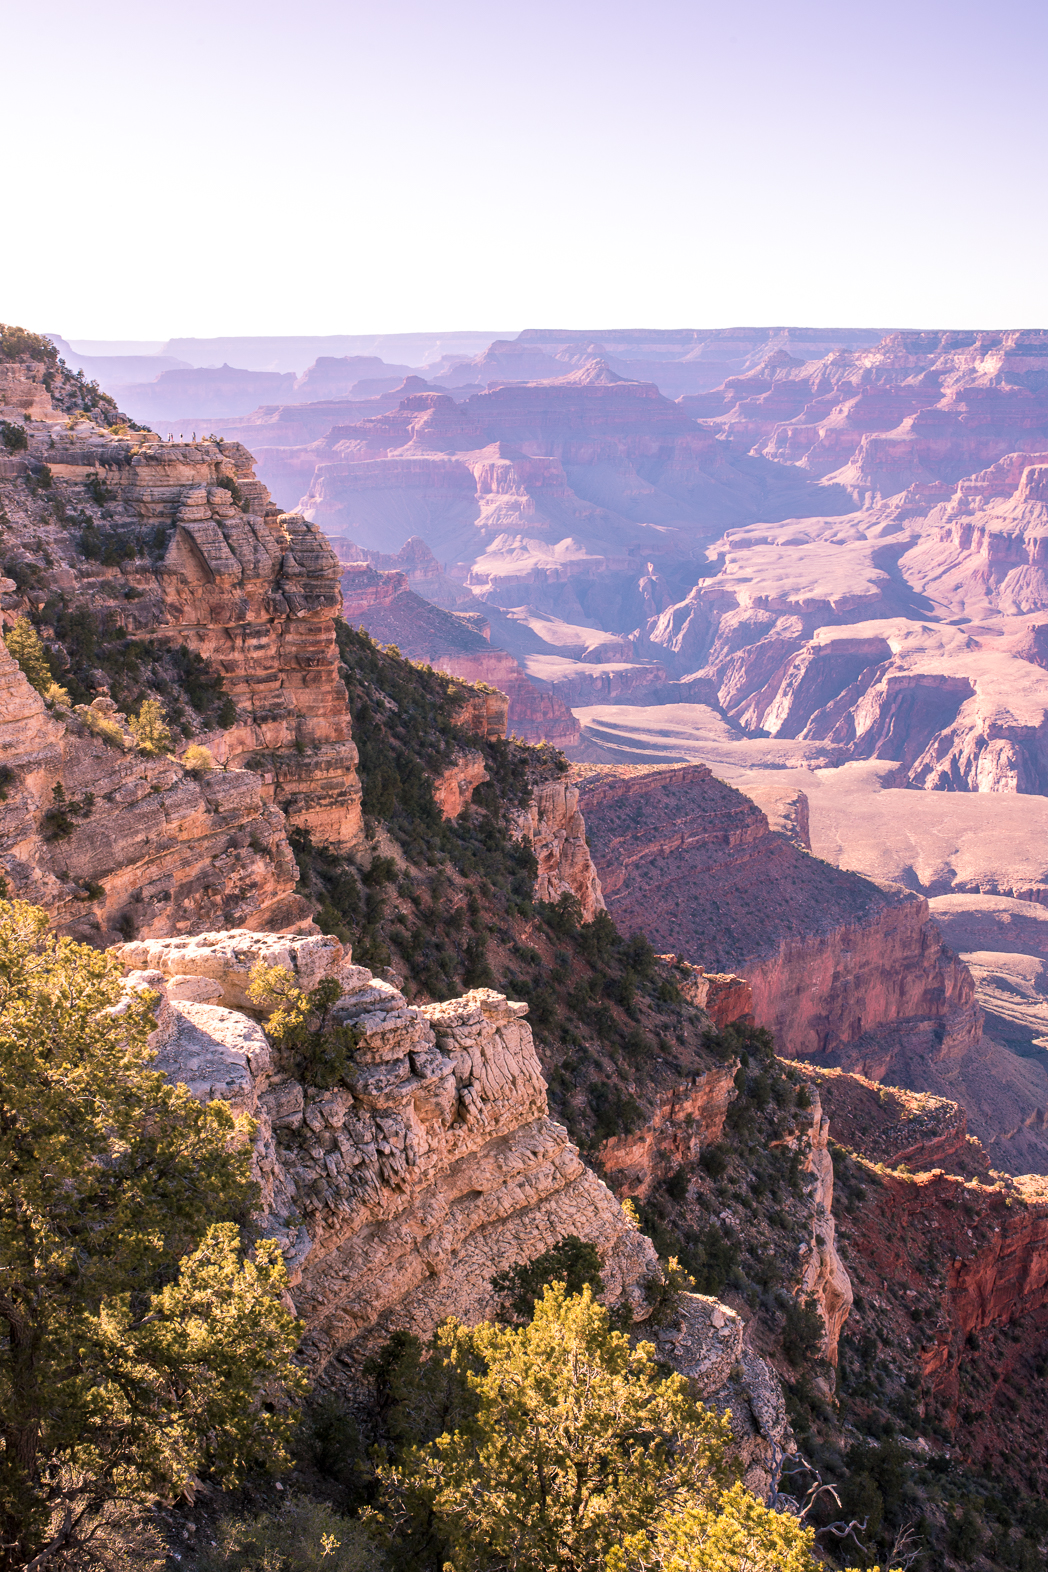 Stacie Flinner Grand Canyon Artemis Design Co-3.jpg